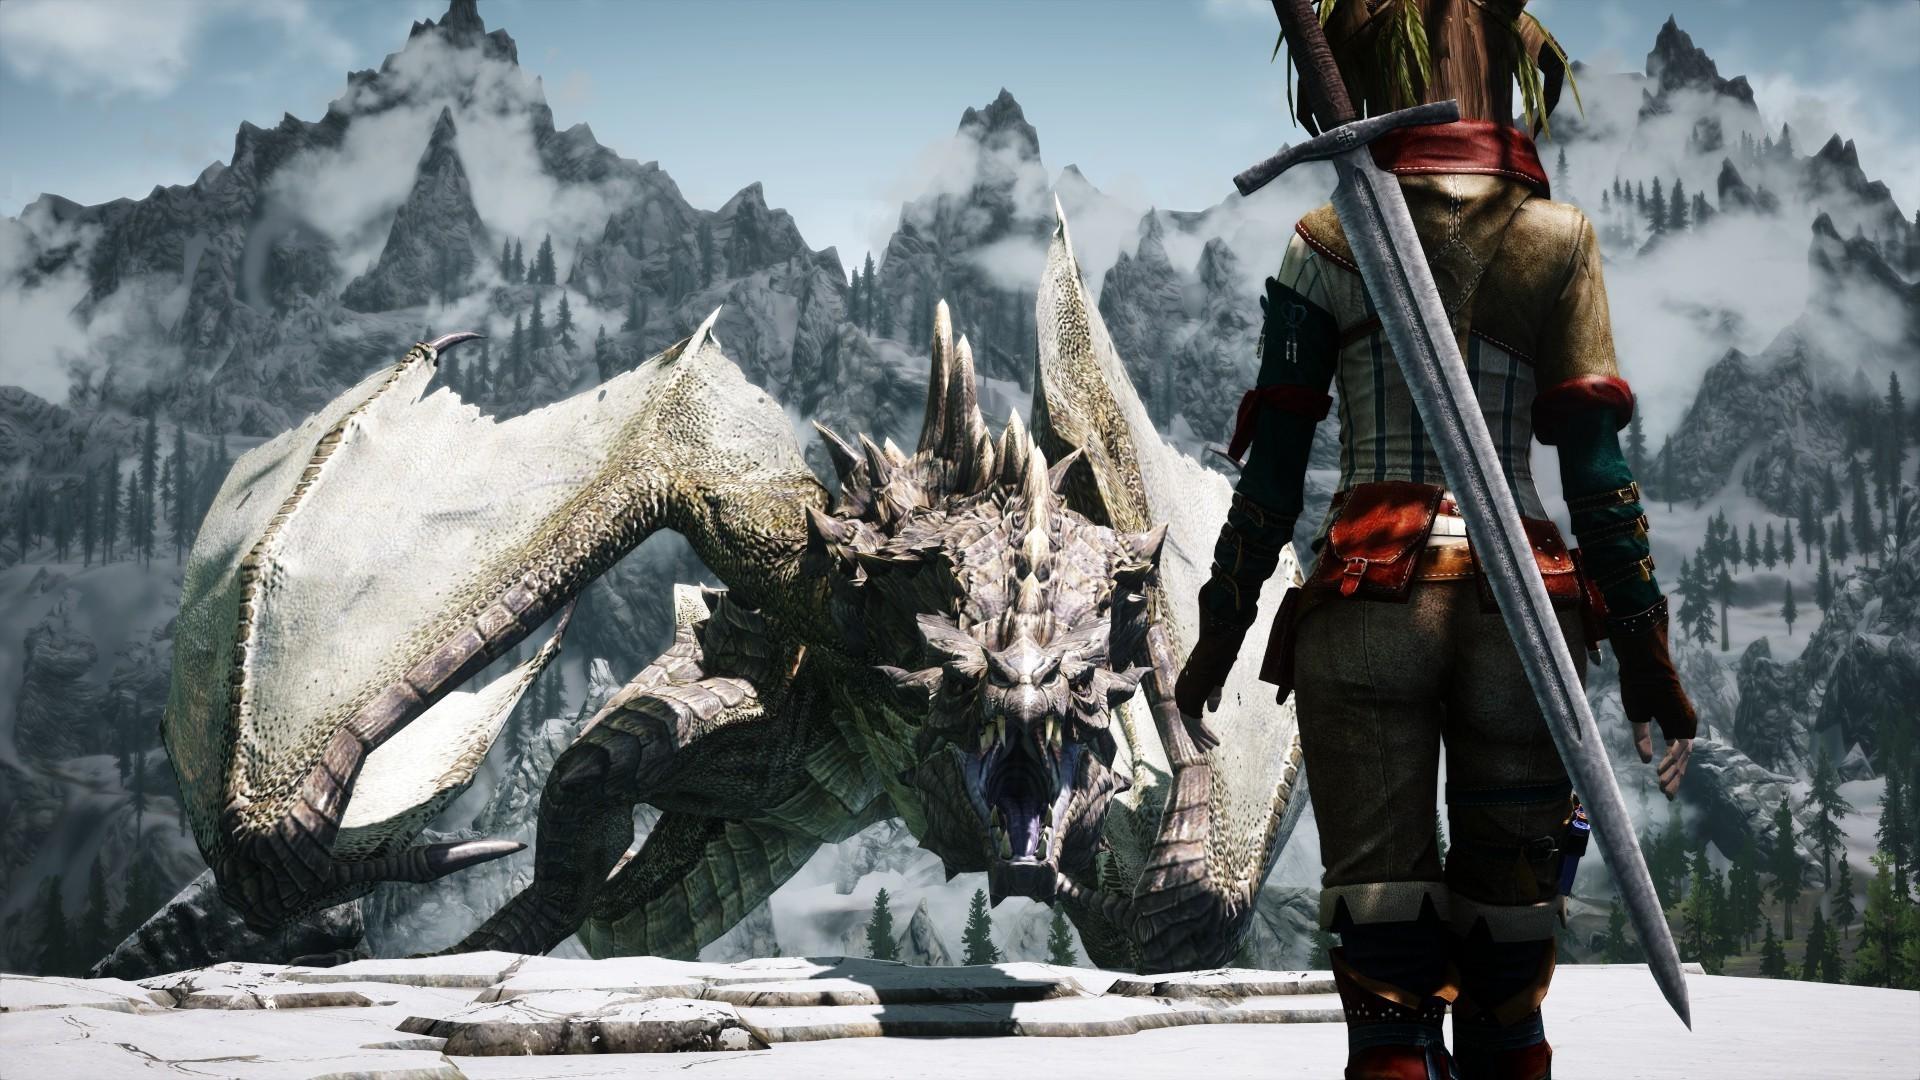 dragonborn, The Elder Scrolls, The Elder Scrolls V: Skyrim, Women, Dragon,  3D, Screenshots Wallpapers HD / Desktop and Mobile Backgrounds